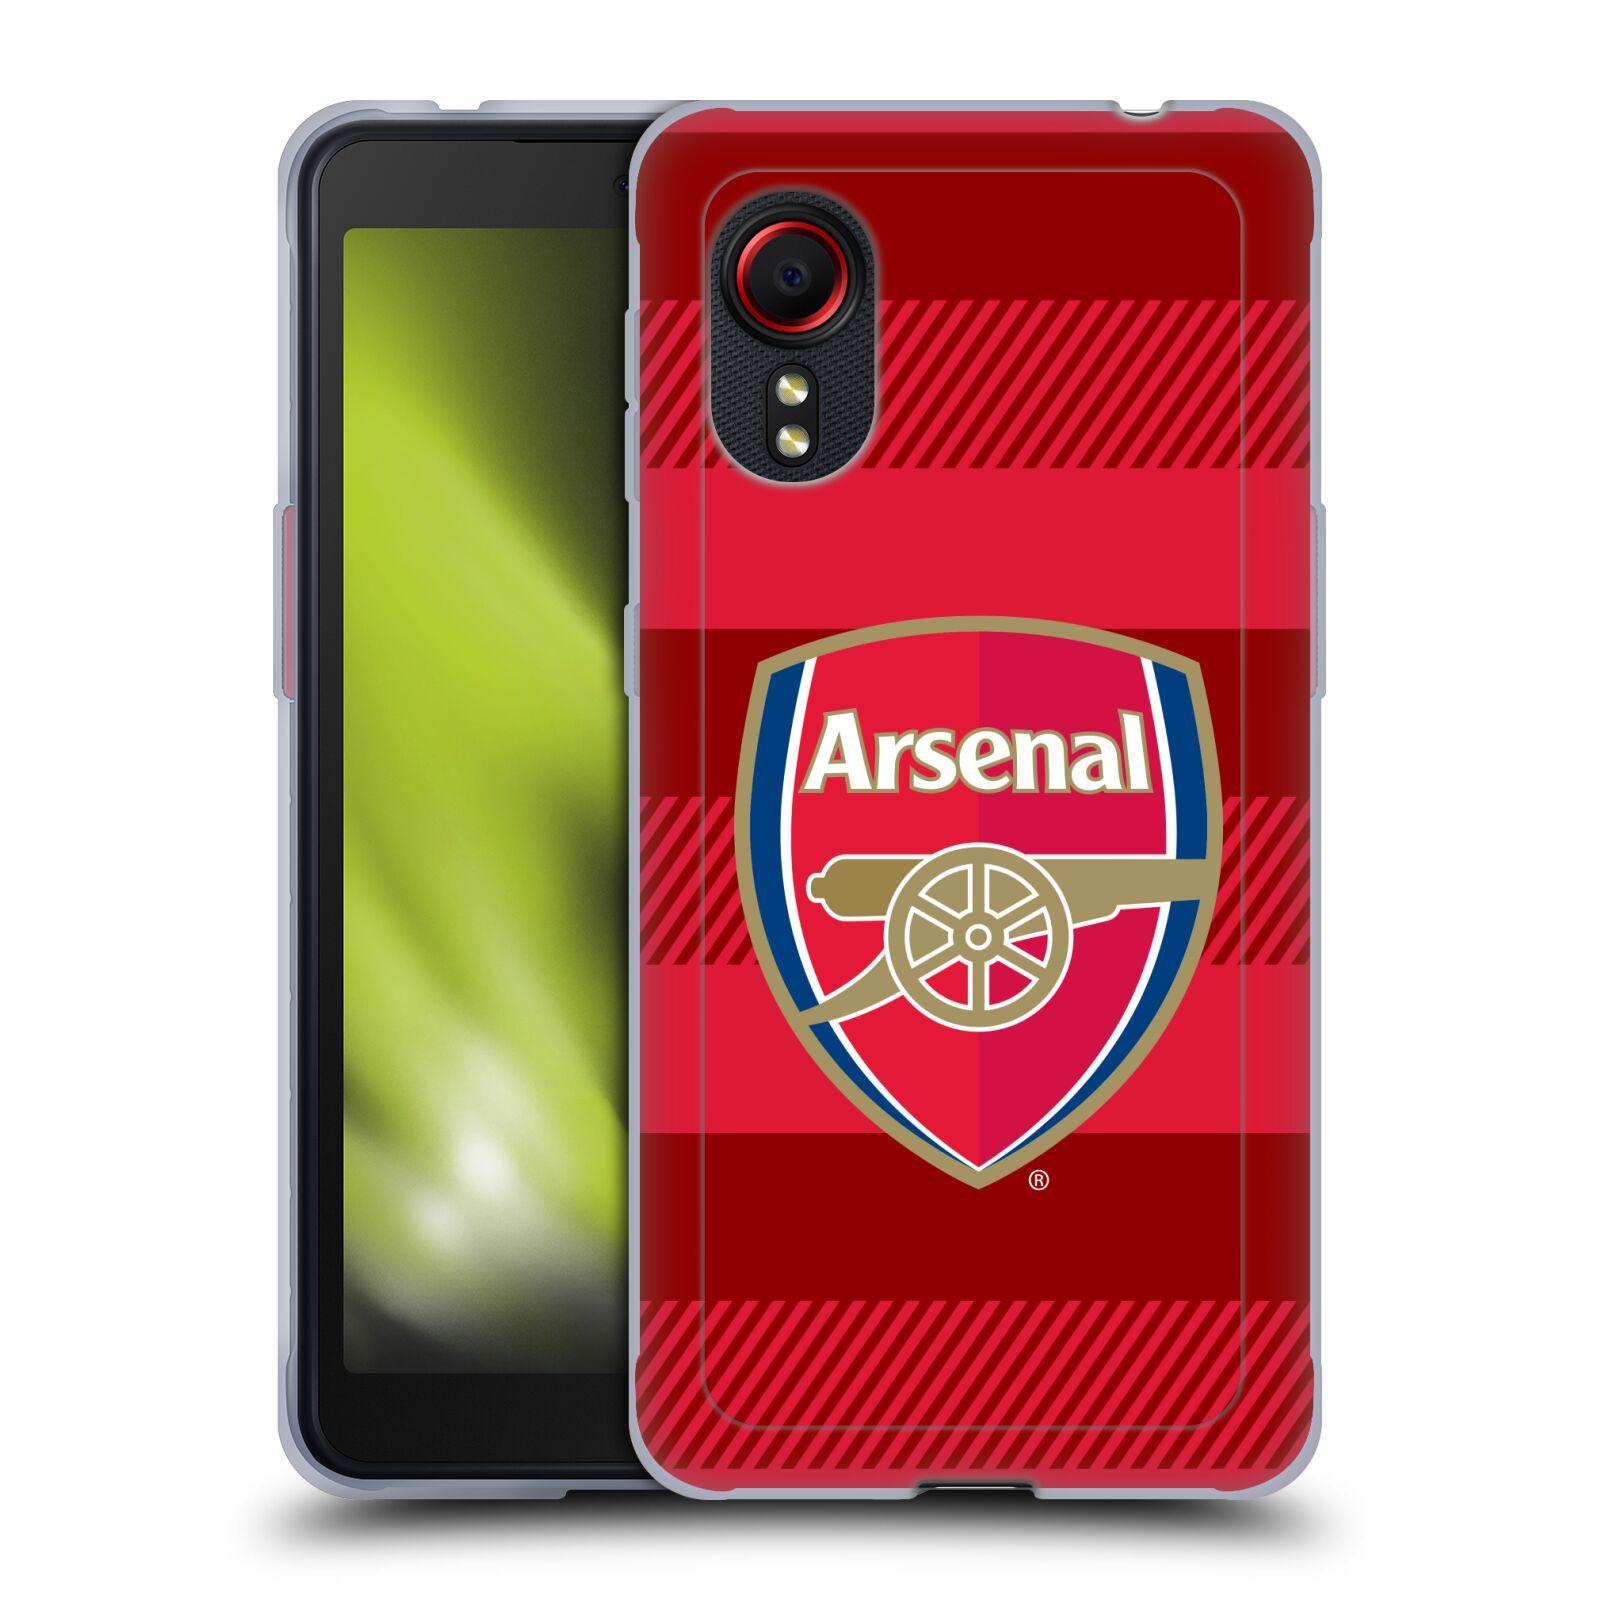 Silikonové pouzdro na mobil Samsung Galaxy Xcover 5 - Head Case - Arsenal FC - Logo s pruhy